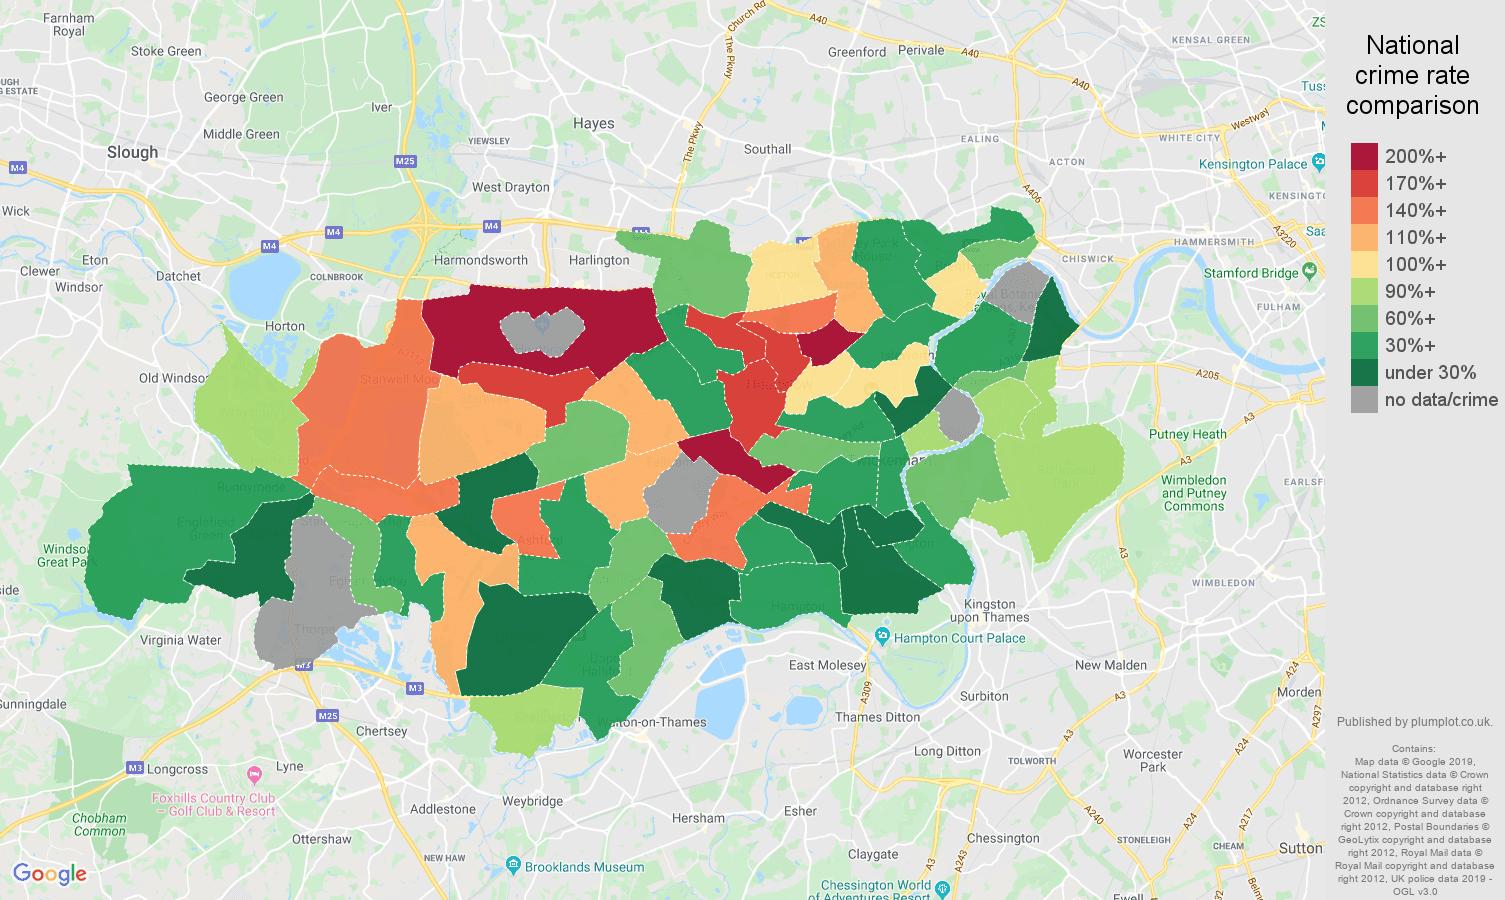 Twickenham possession of weapons crime rate comparison map